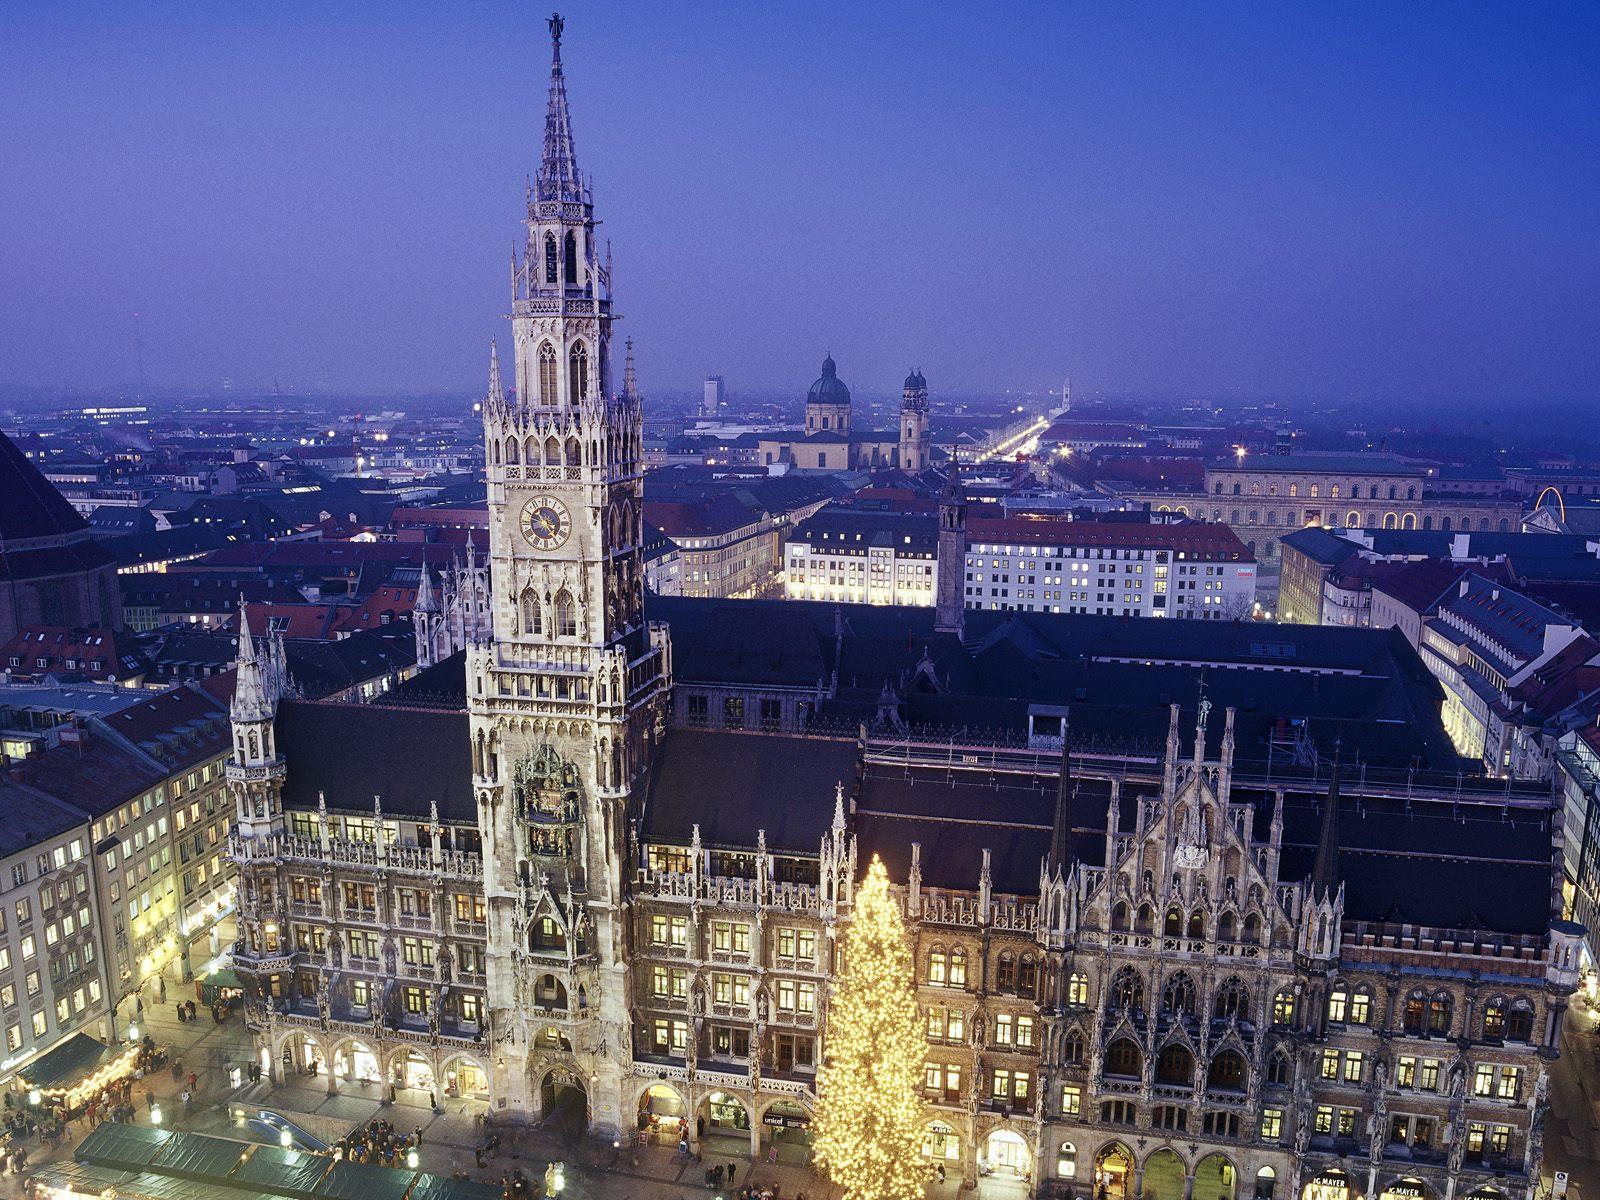 Munich, Germany - Tourist Destinations